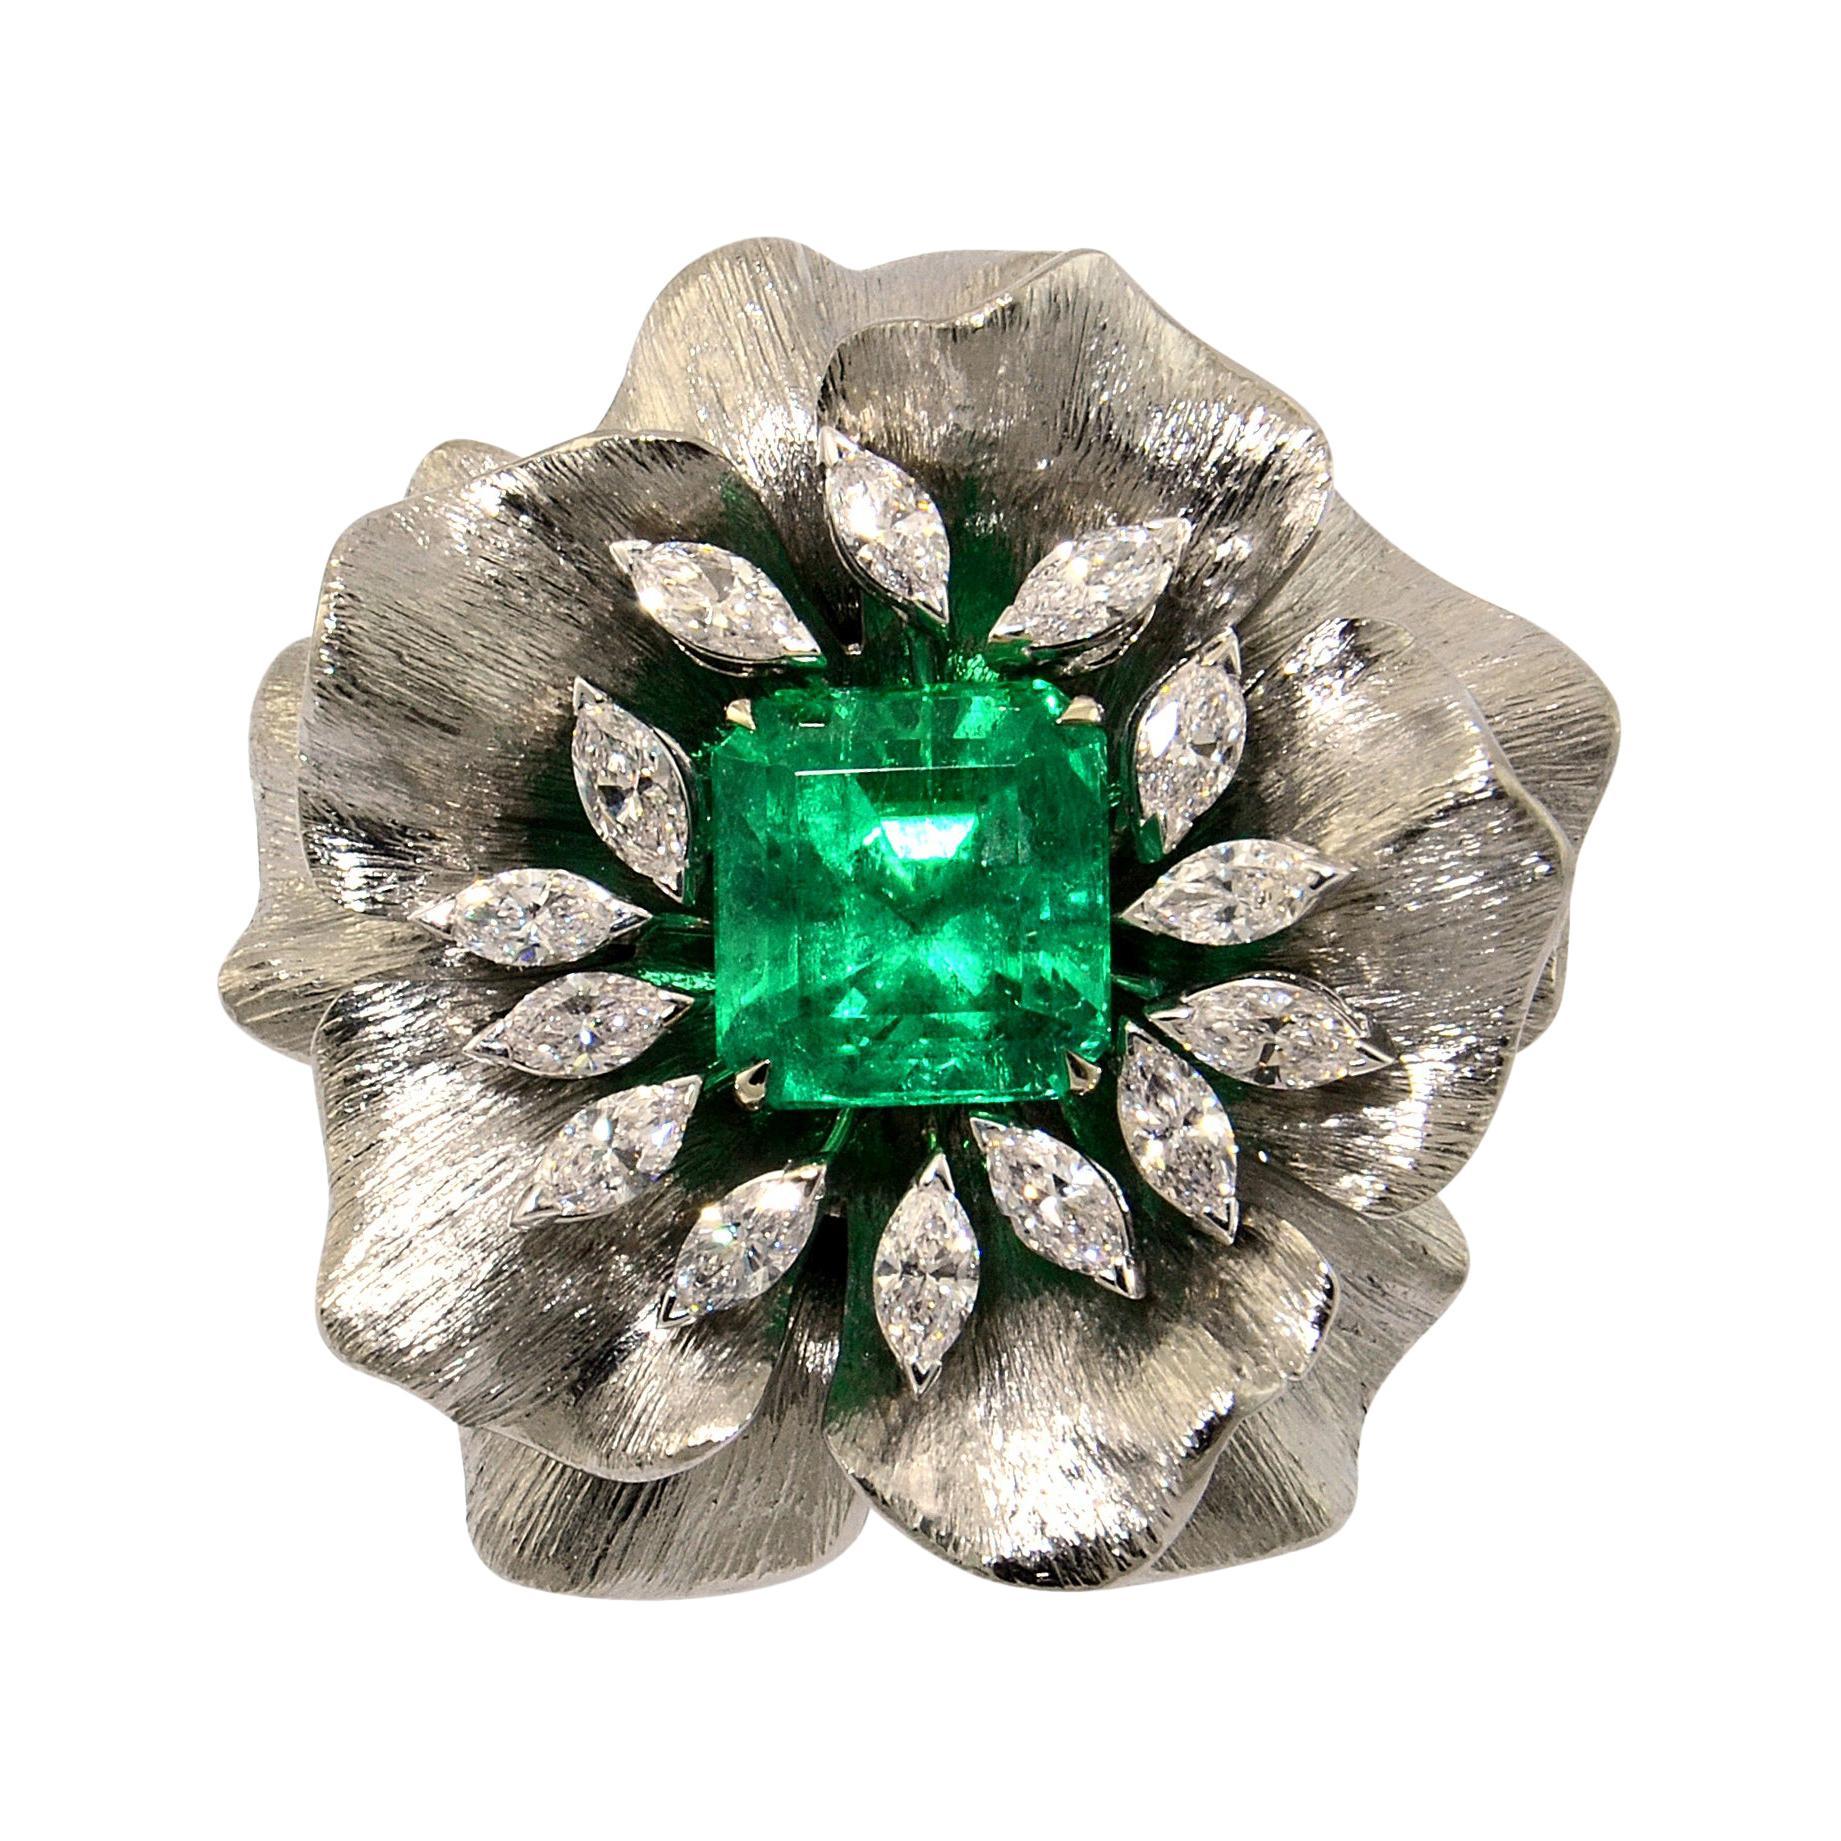 6.07 Emerald 1.03 Diamonds Titanium 18KT White Gold Made in Italy Ring